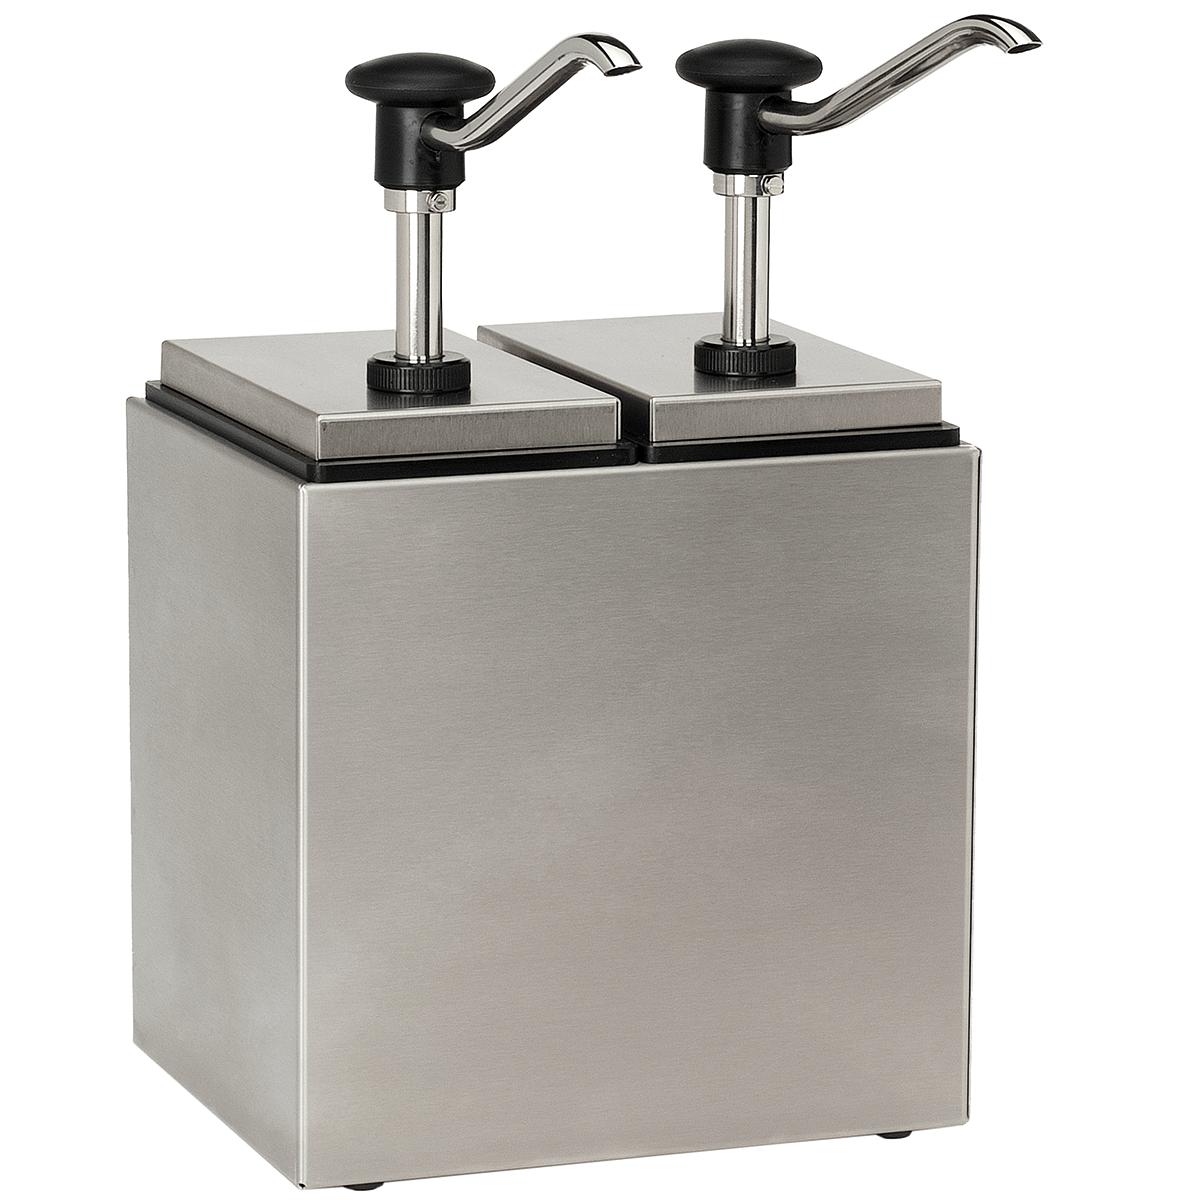 Sauce Bar Push Button Dispensers (2,5 L / 1-6 Piece Design)